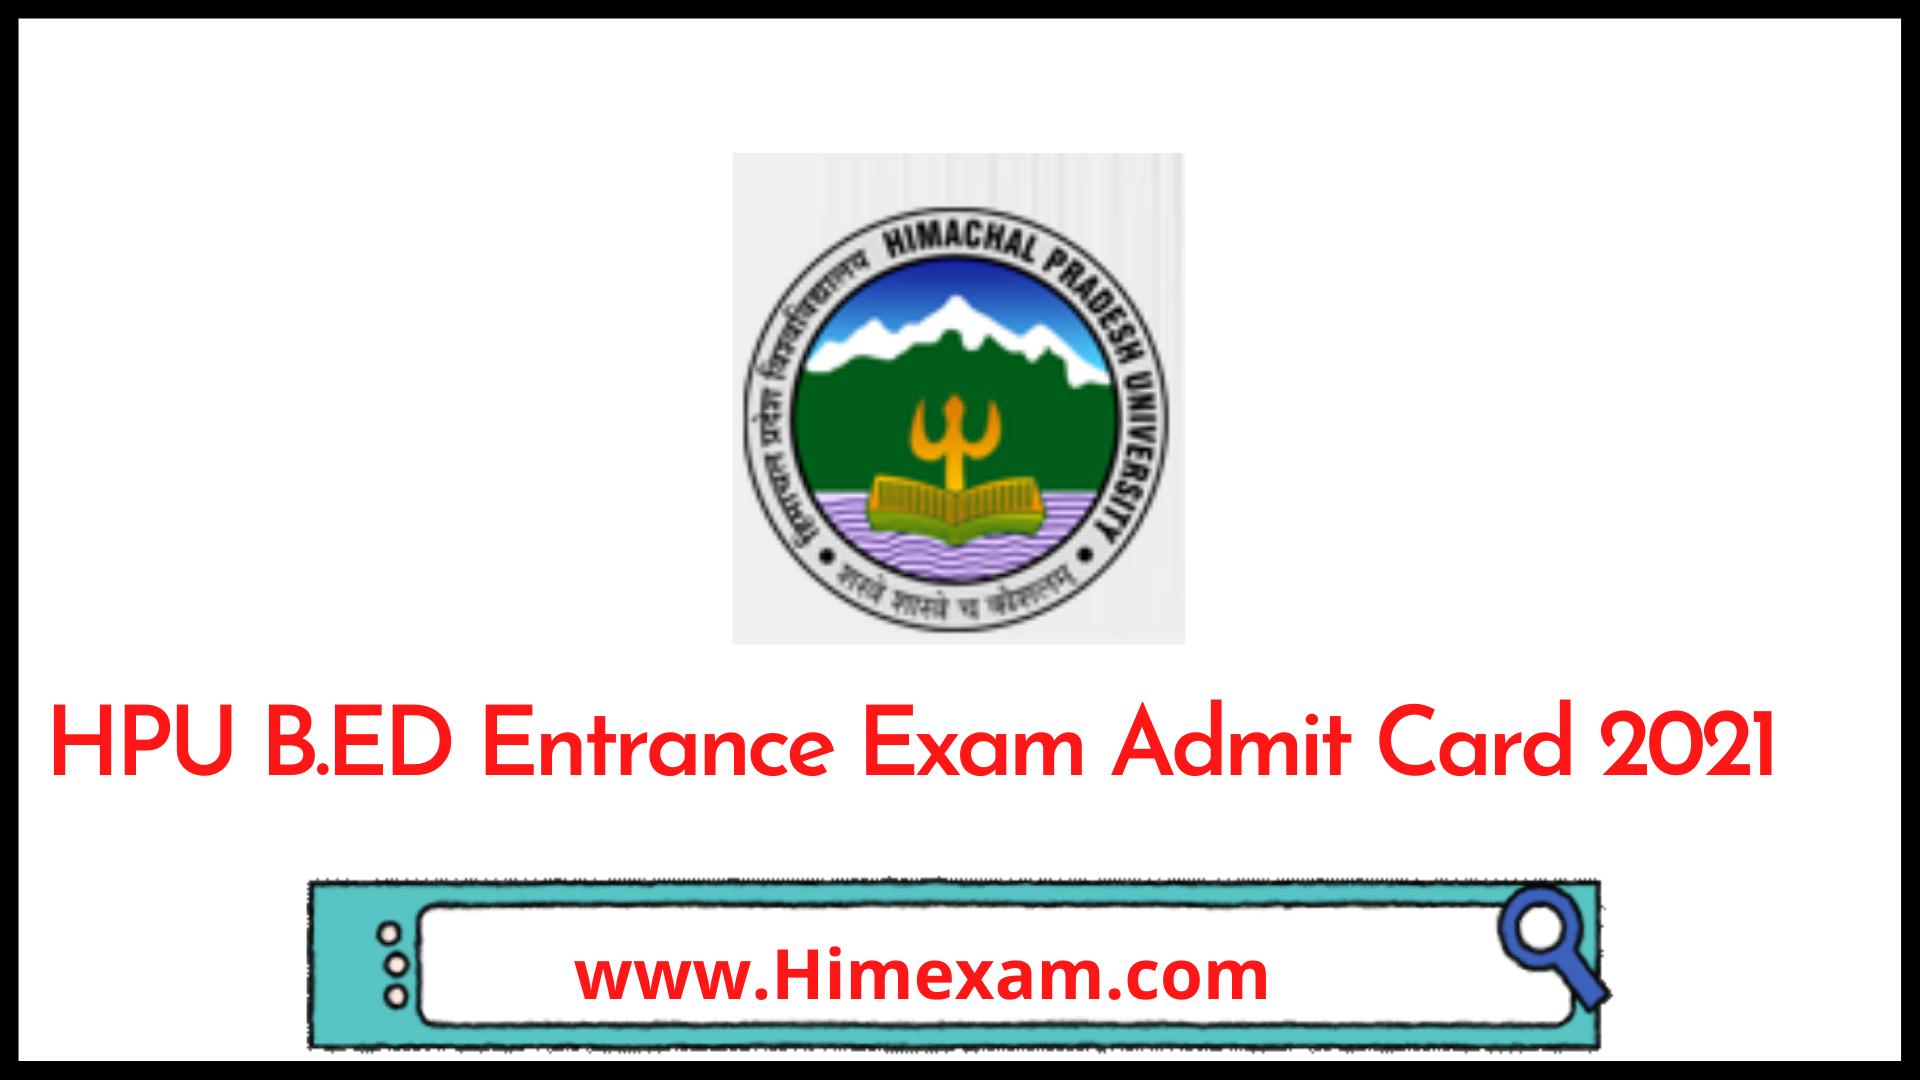 HPU B.ED Entrance Exam Admit Card 2021